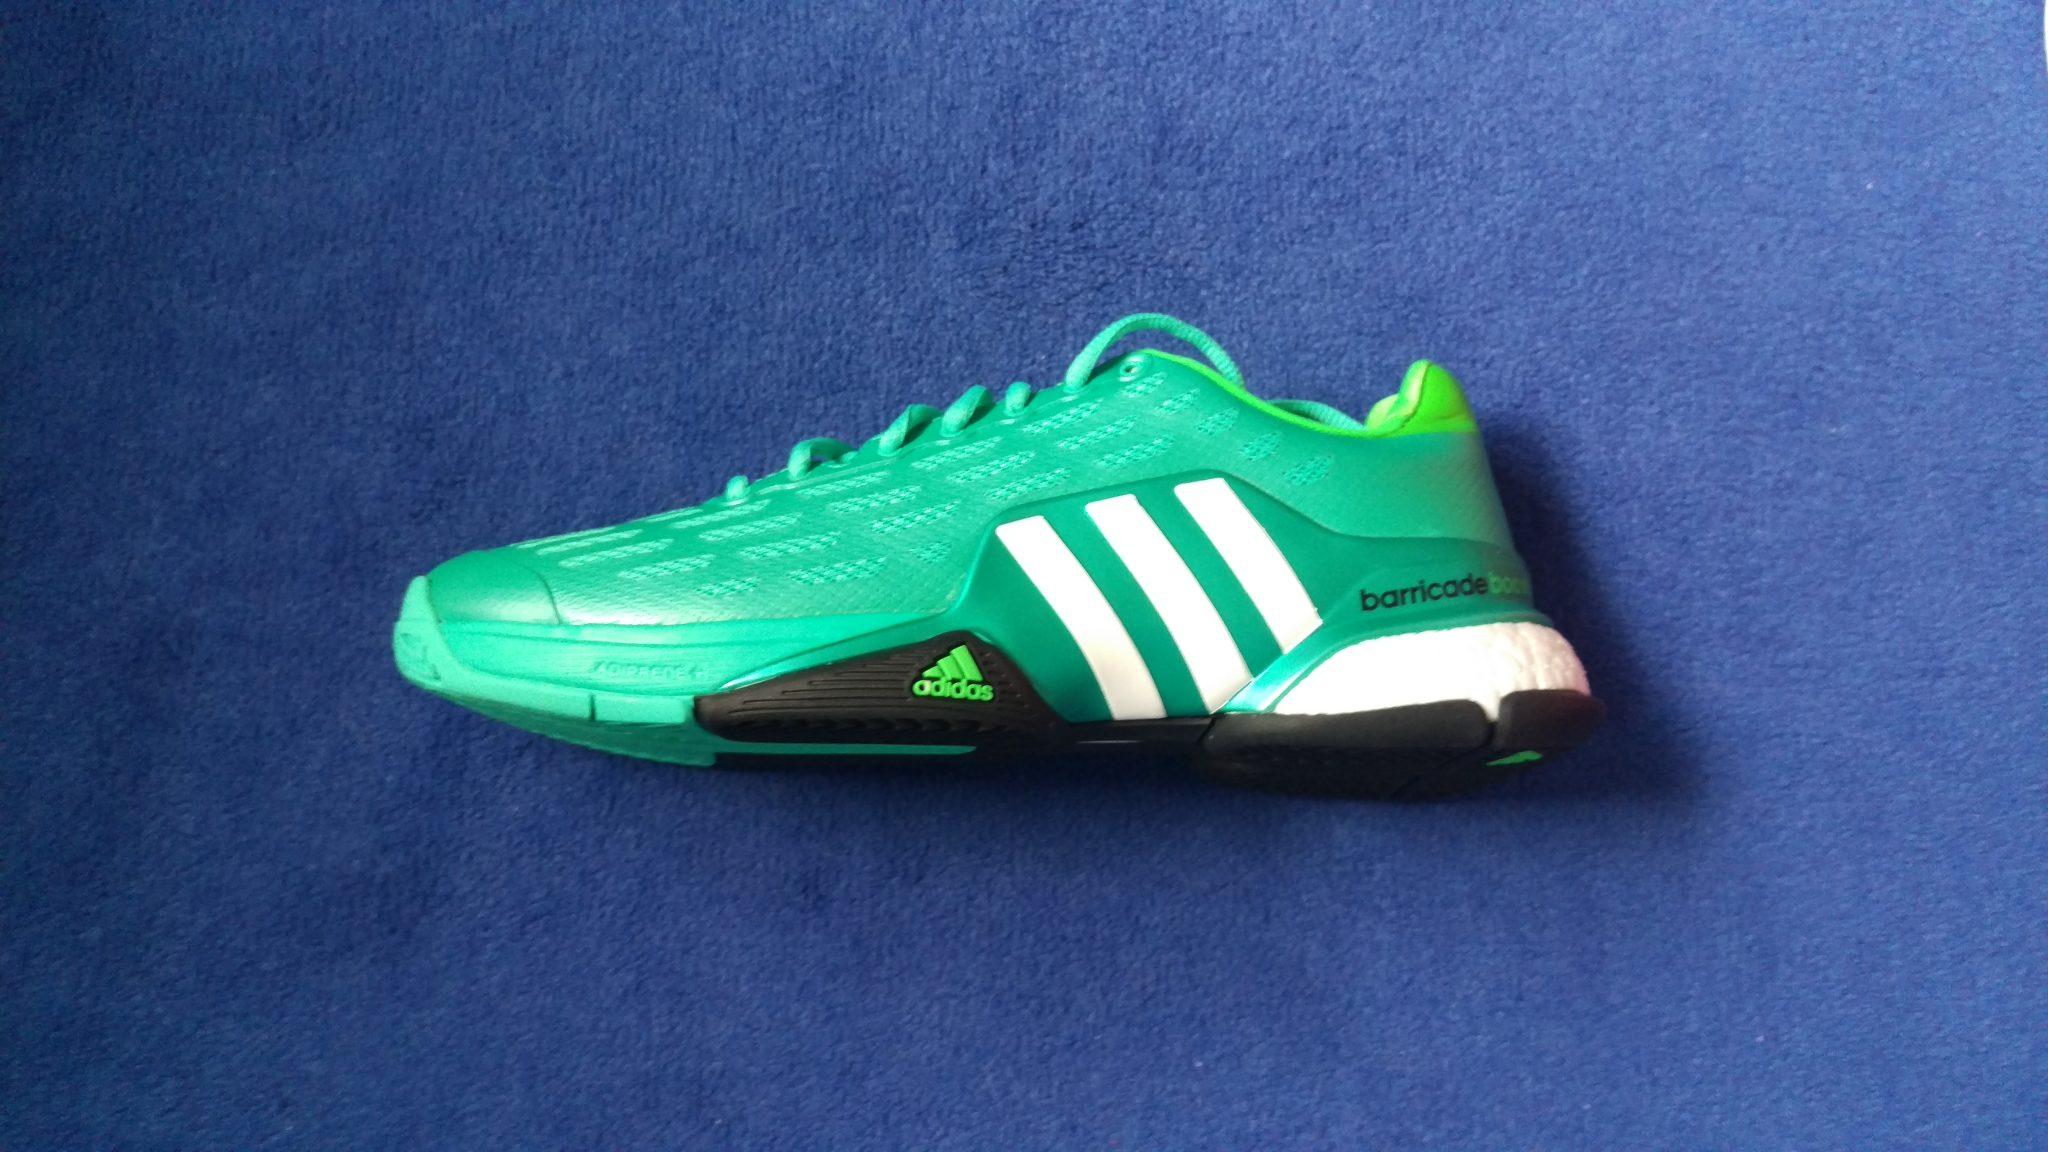 Adidas Barricade 9 Boost Tennis -Shoe Review – Love Tennis Blog